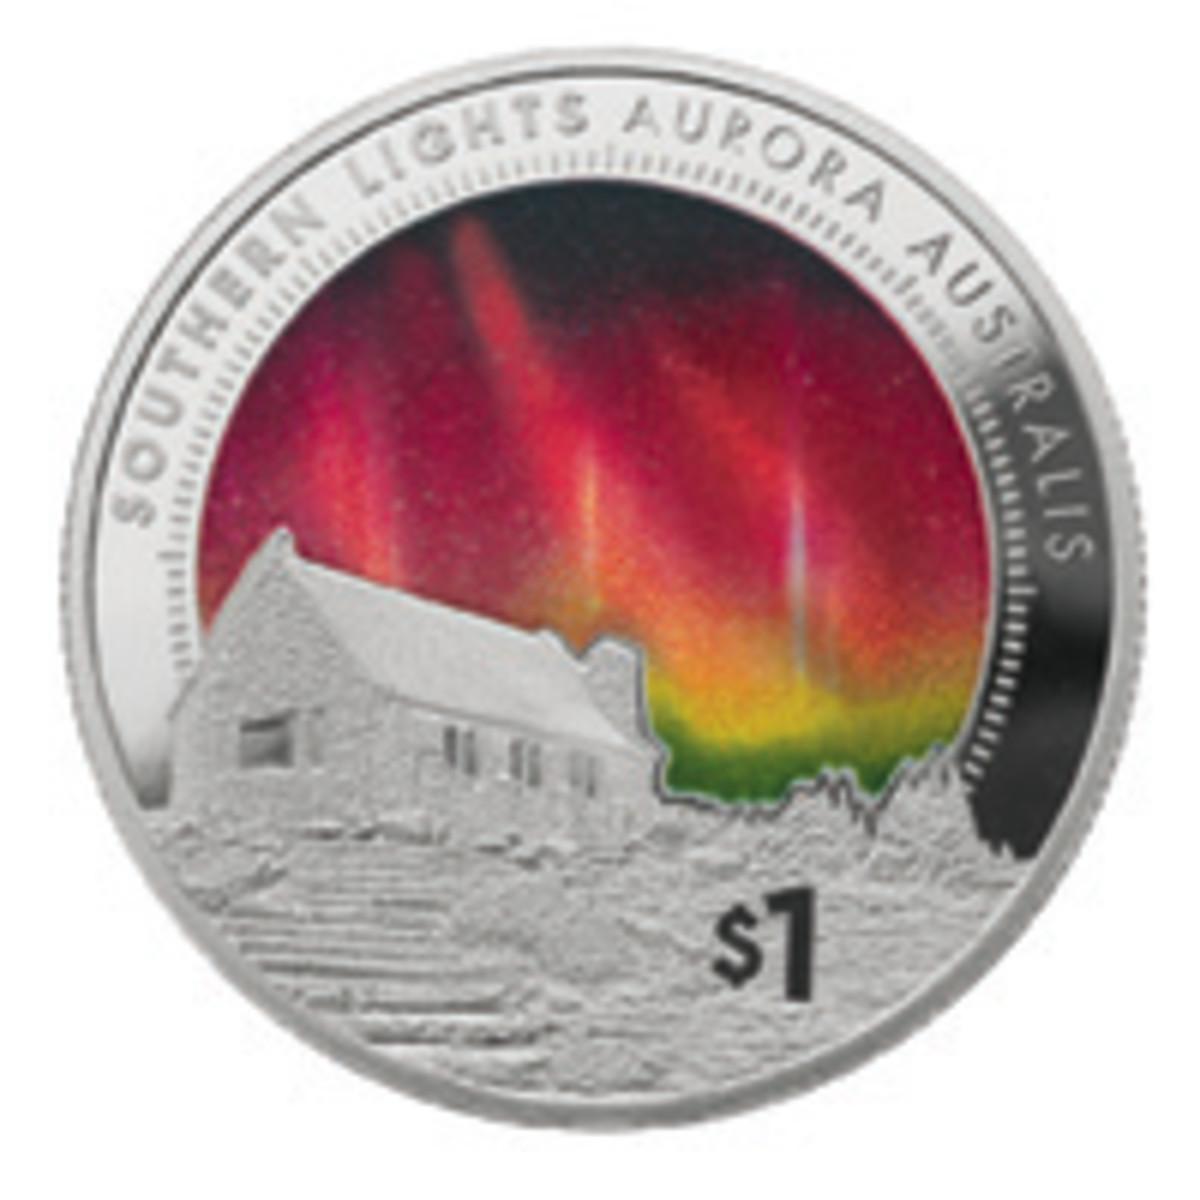 New Zealand Aurora